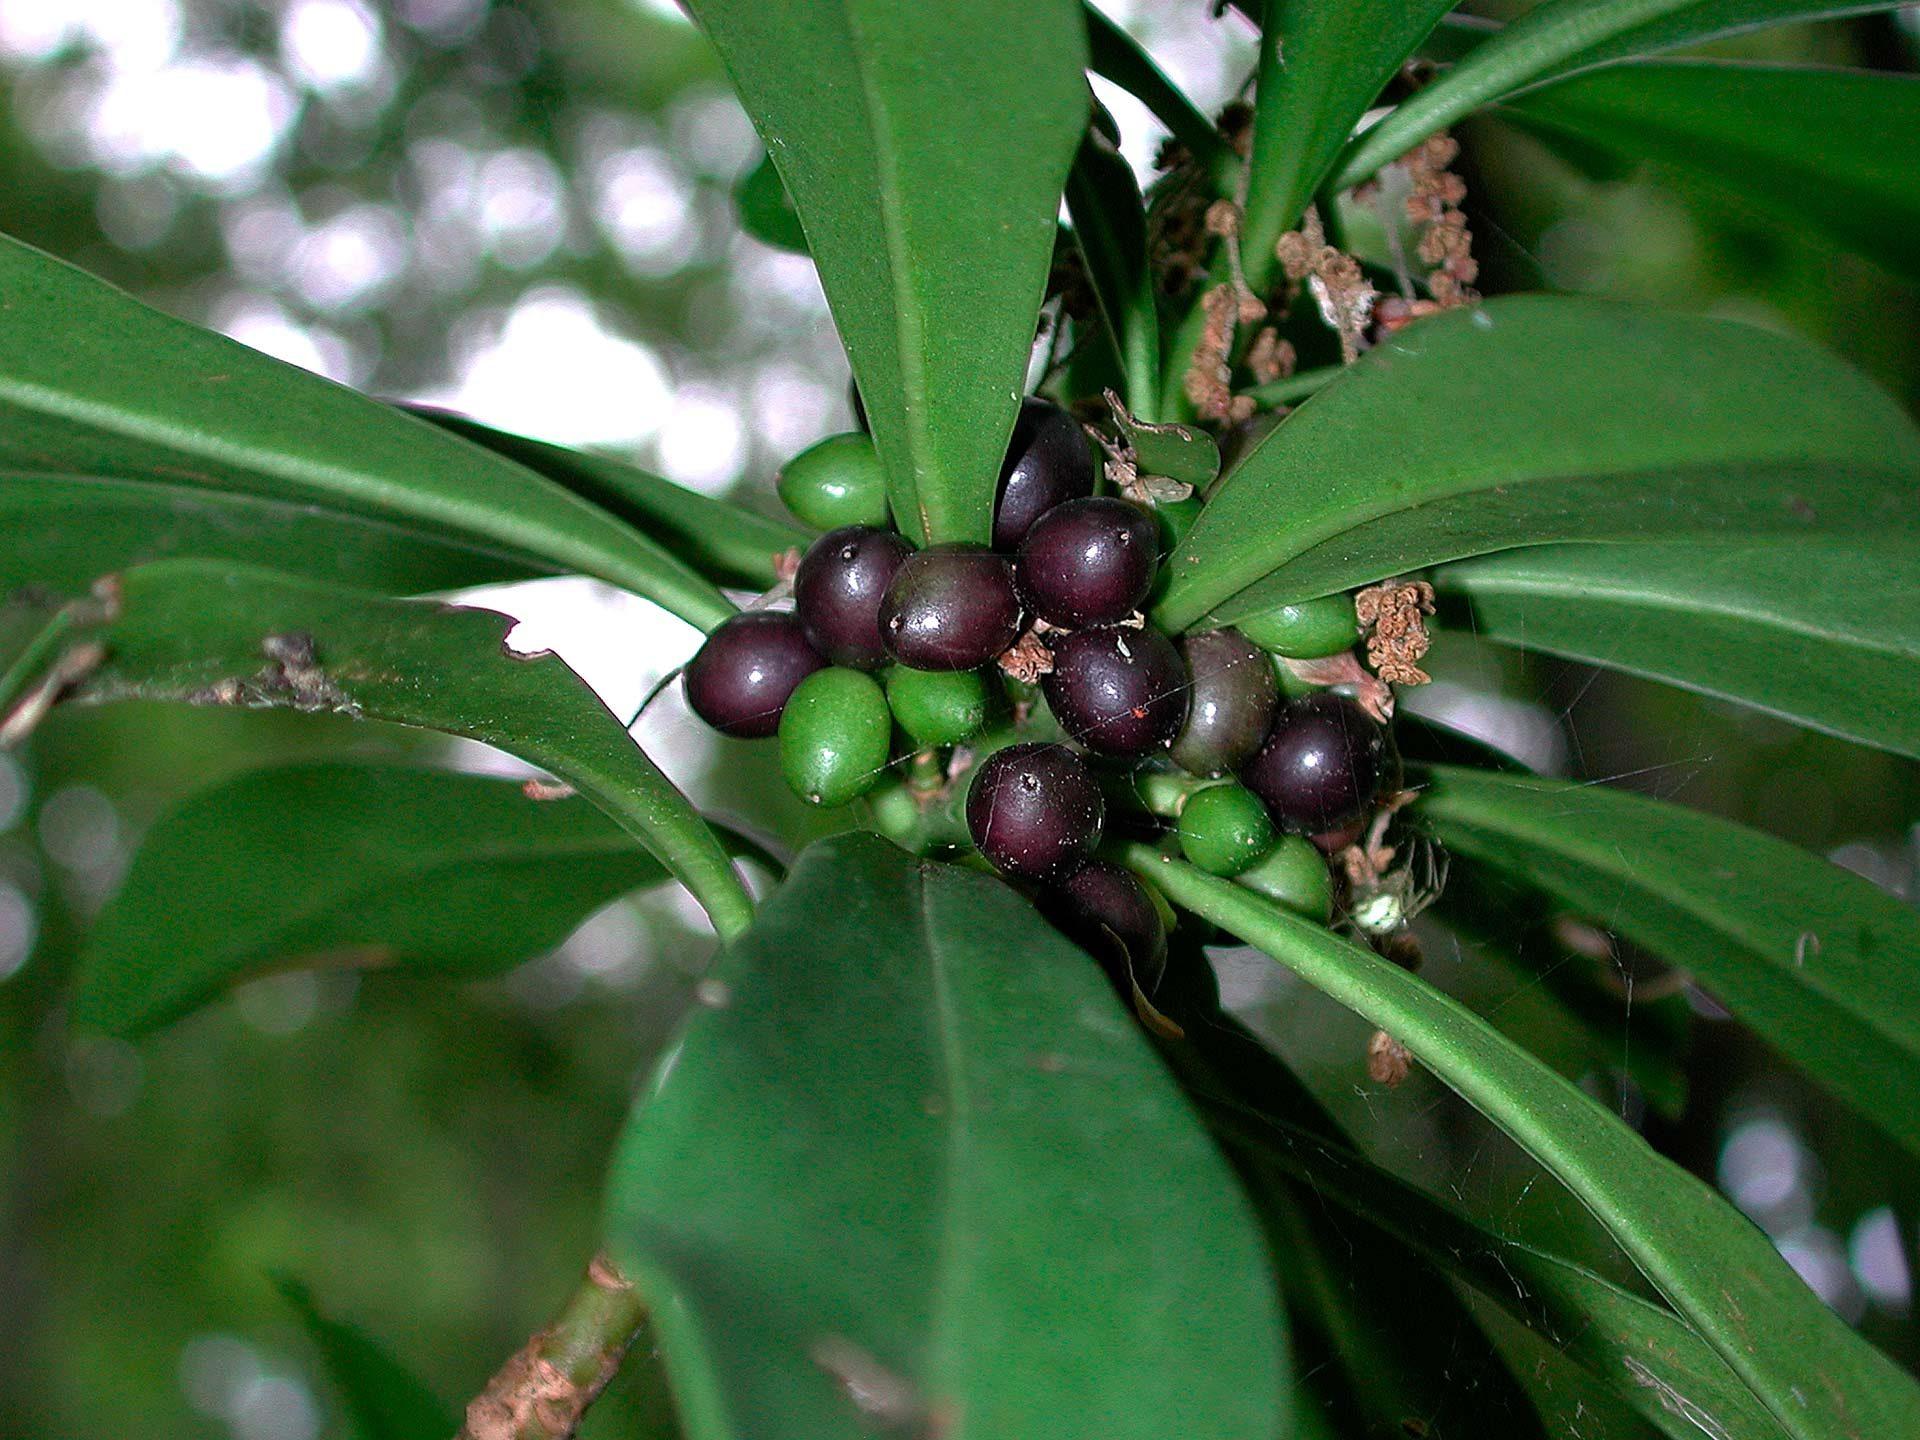 Dafne laurella, olivella